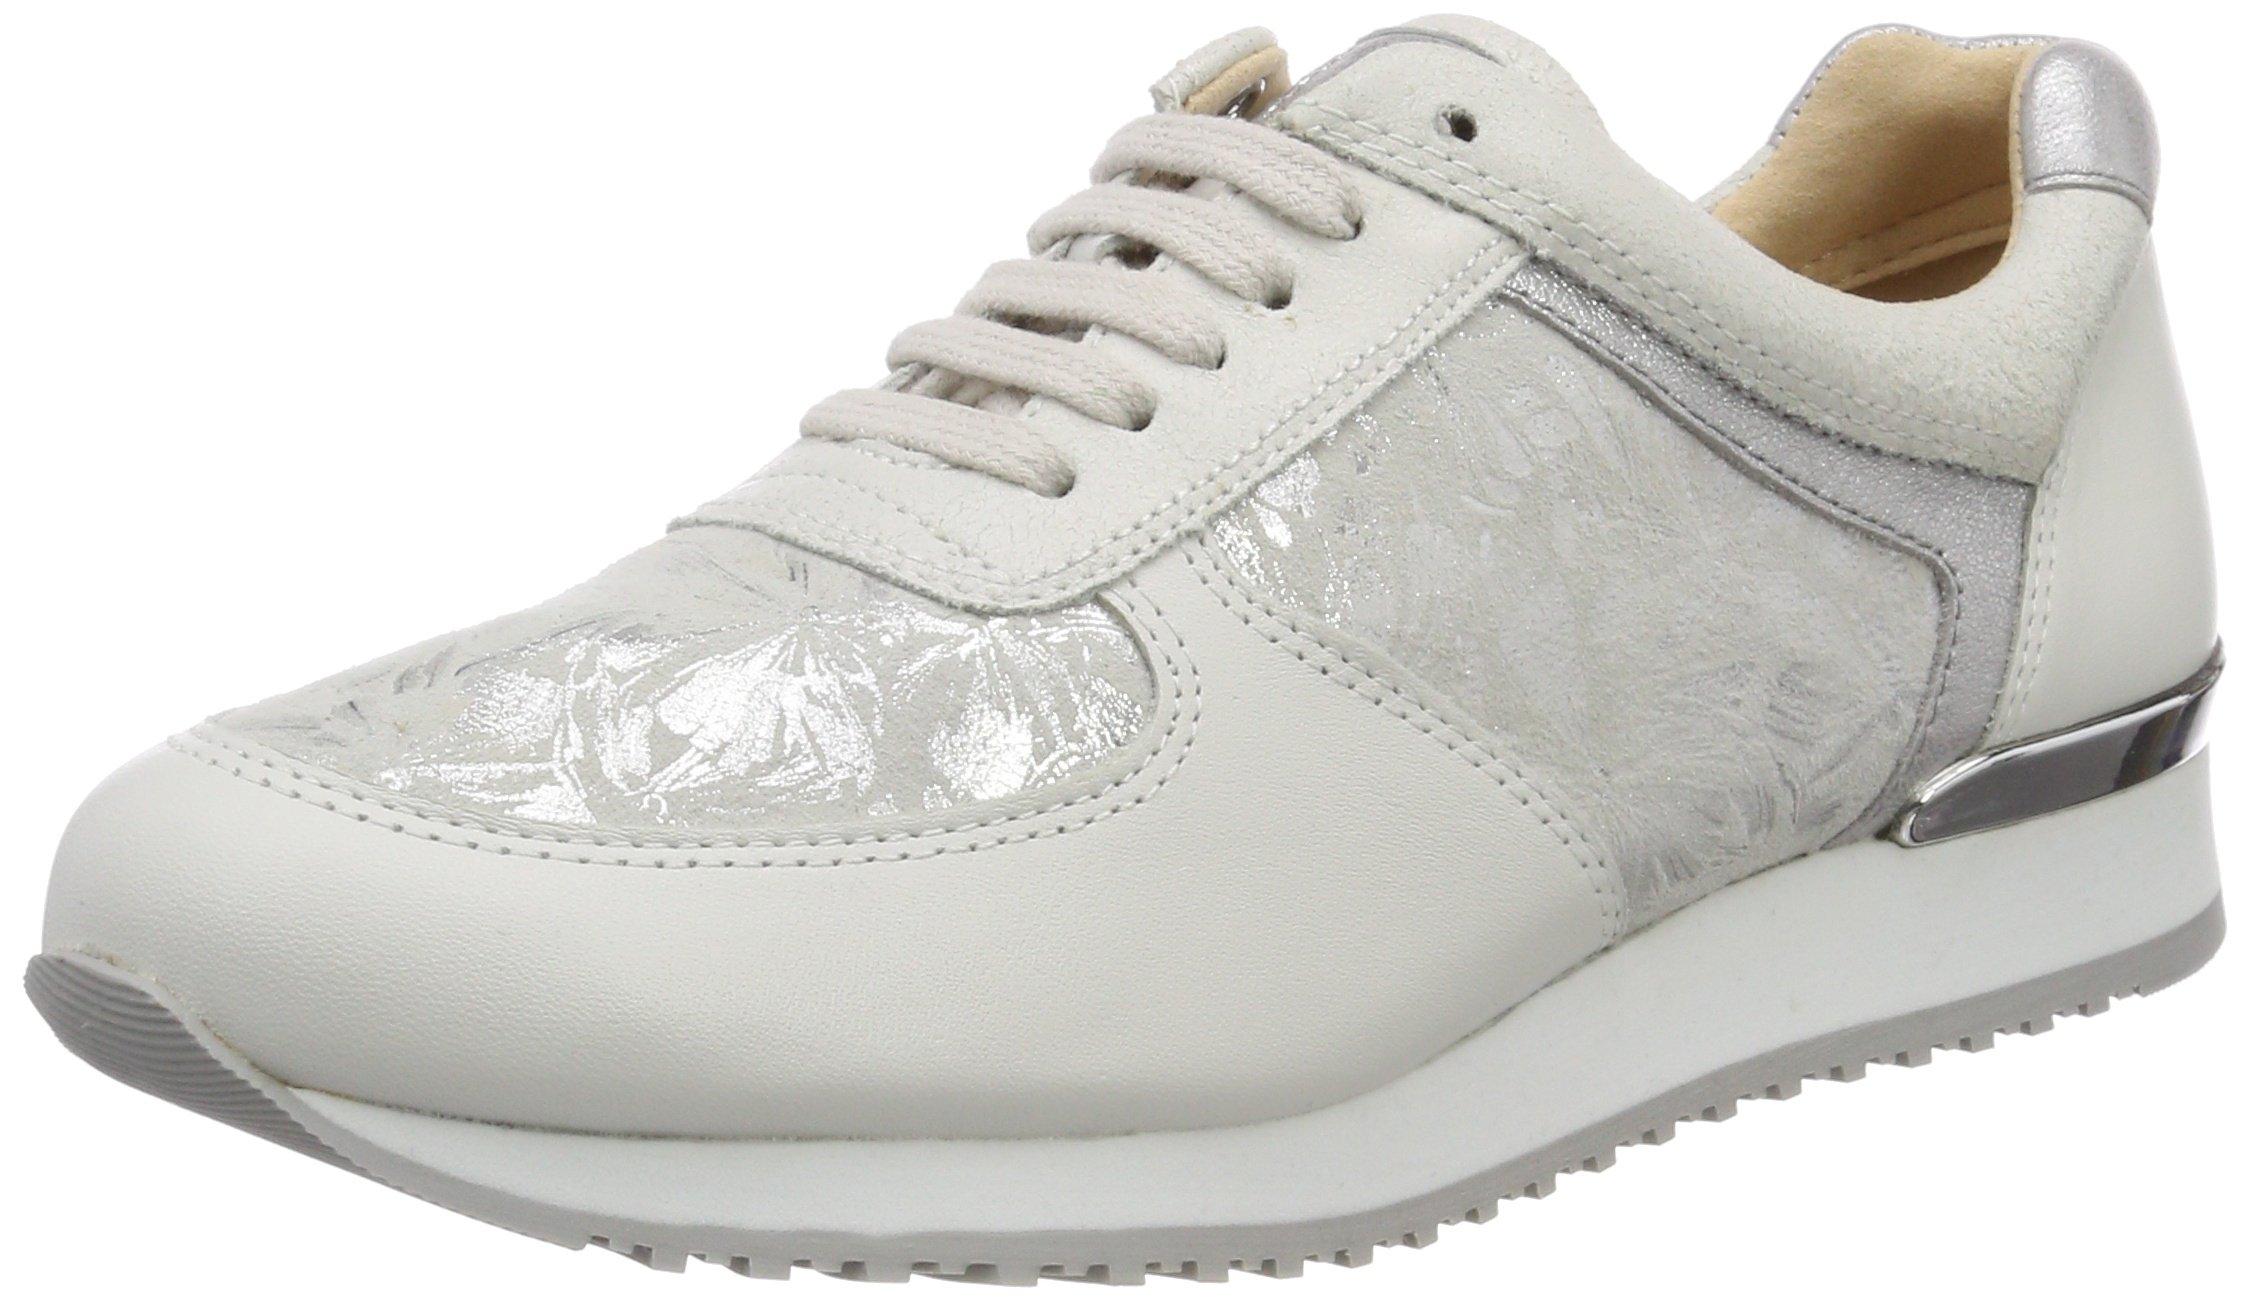 Eu 19740 Caprice 23604Sneakers FemmeBlancwhite Basses Comb A354RLjq